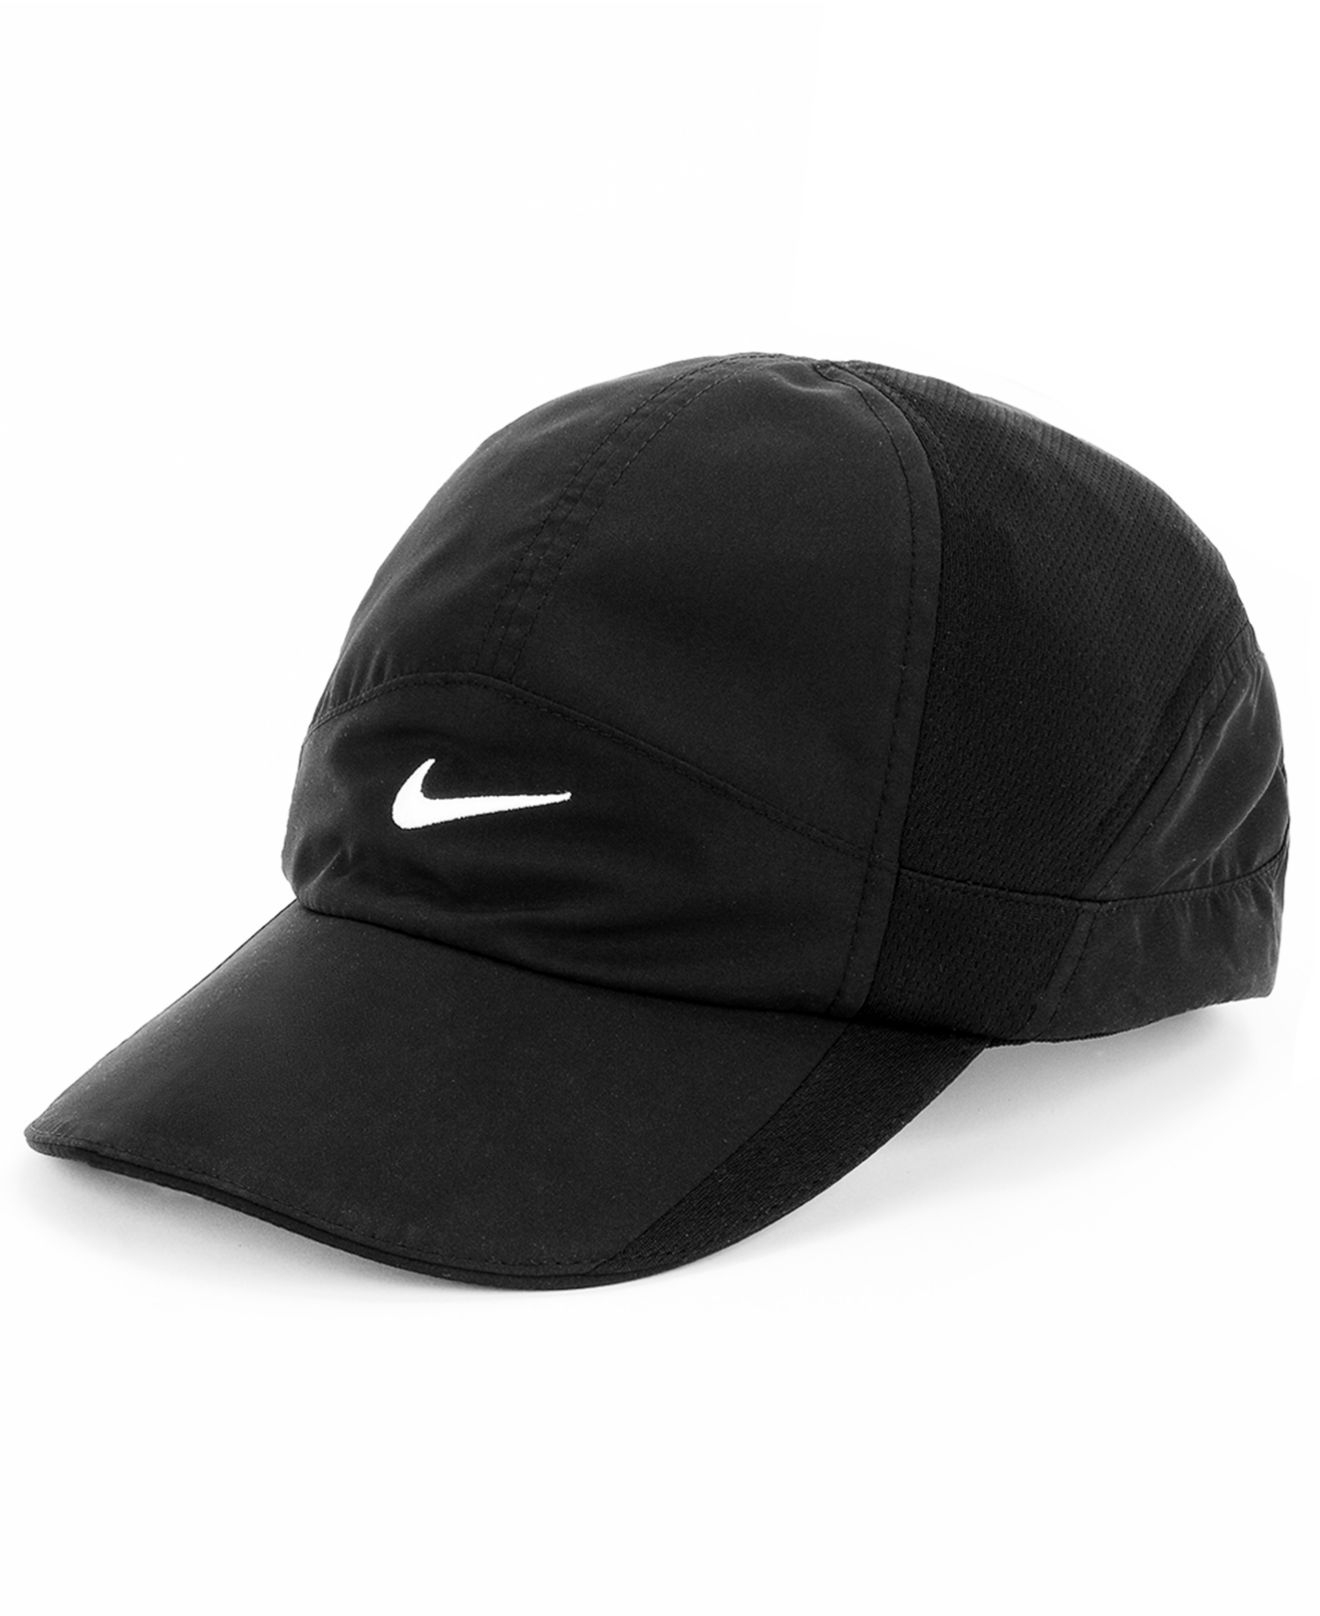 8935b8f977d ... shop lyst nike featherlight 2.0 dri fit sports cap in black ba9a1 22a40